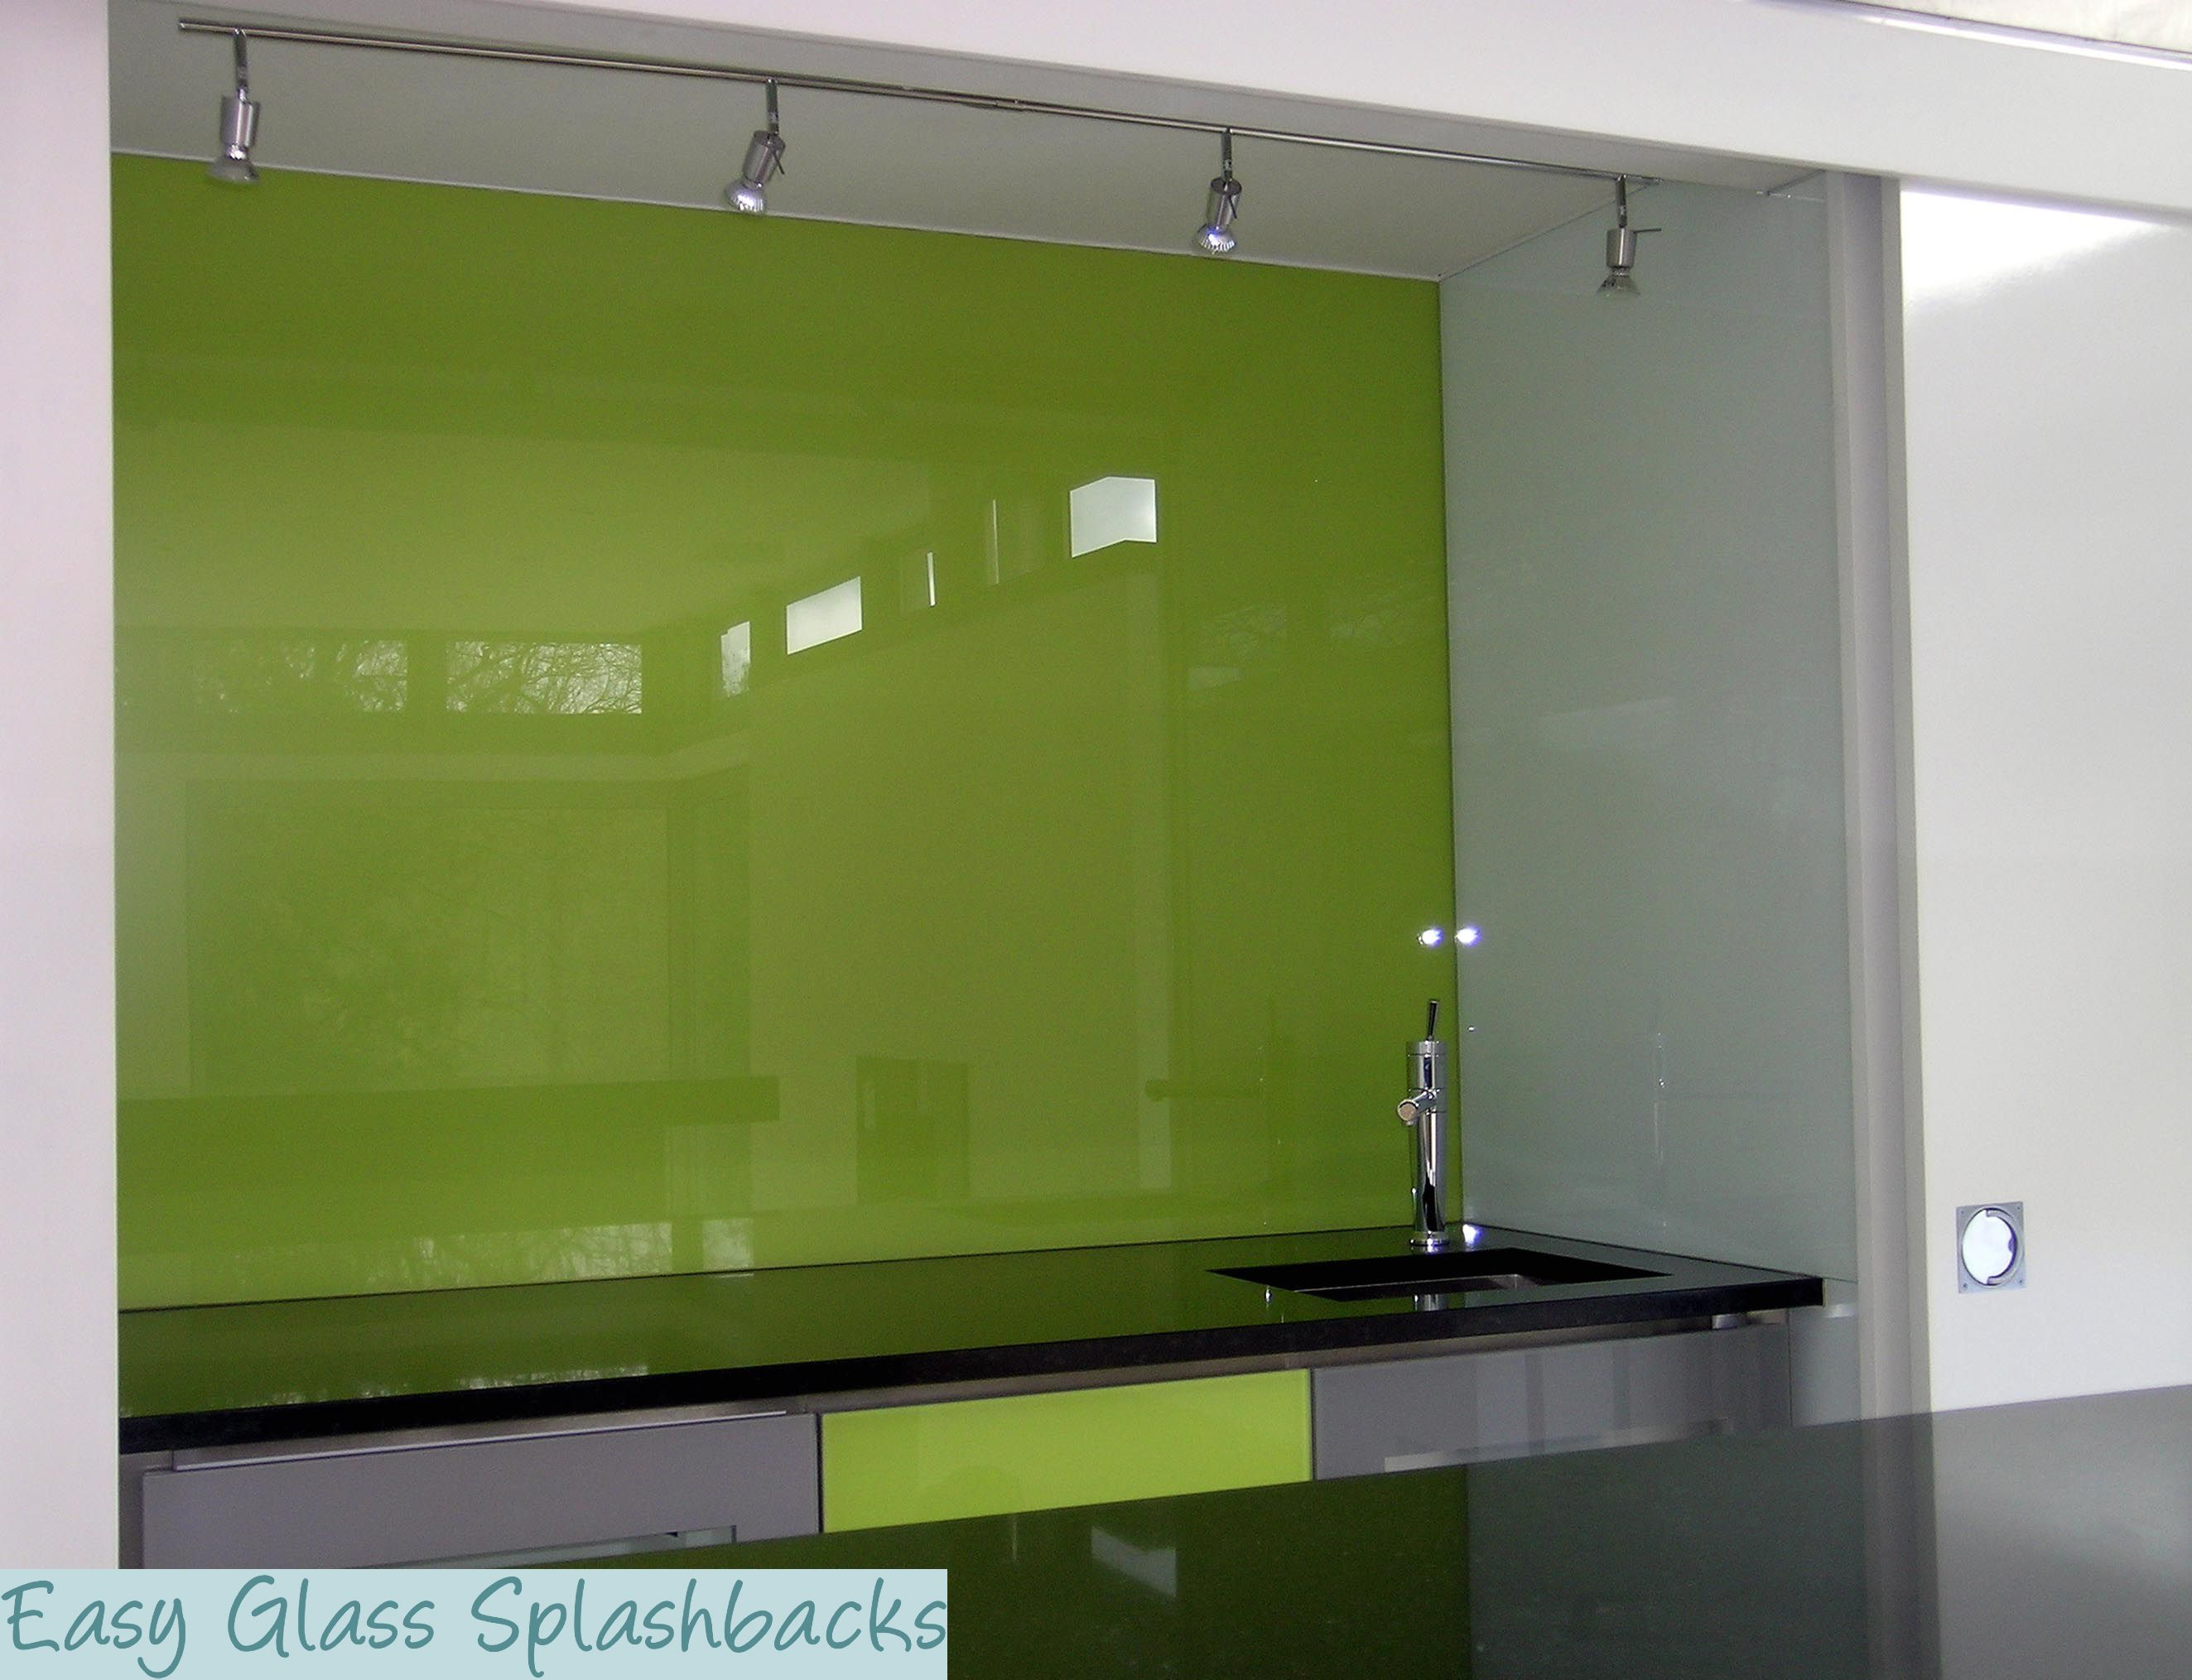 Coloured & Printed Glass Splashbacks & Glass Shower Walls | Pinterest